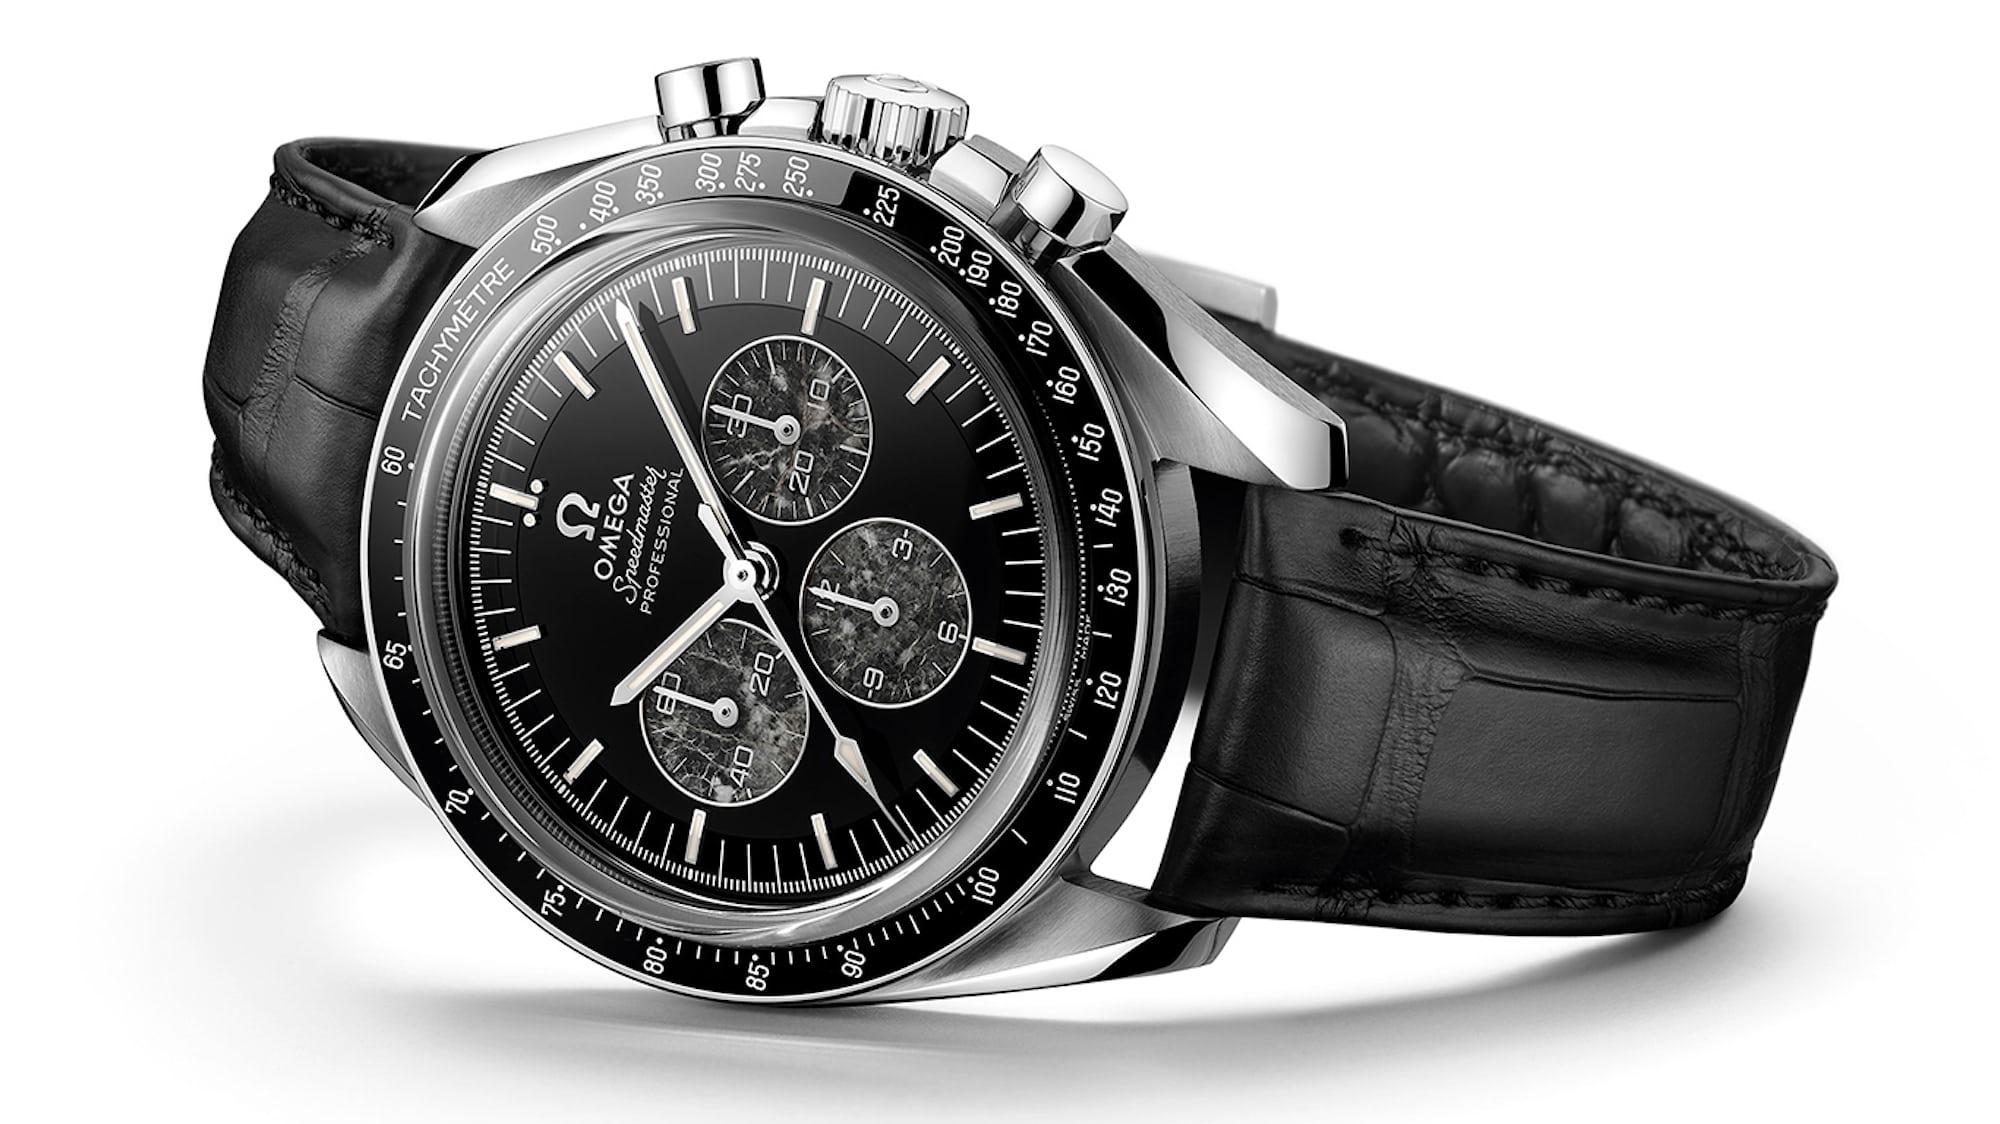 Introducing: The Omega Speedmaster Professional Moonwatch Caliber 321 Platinum